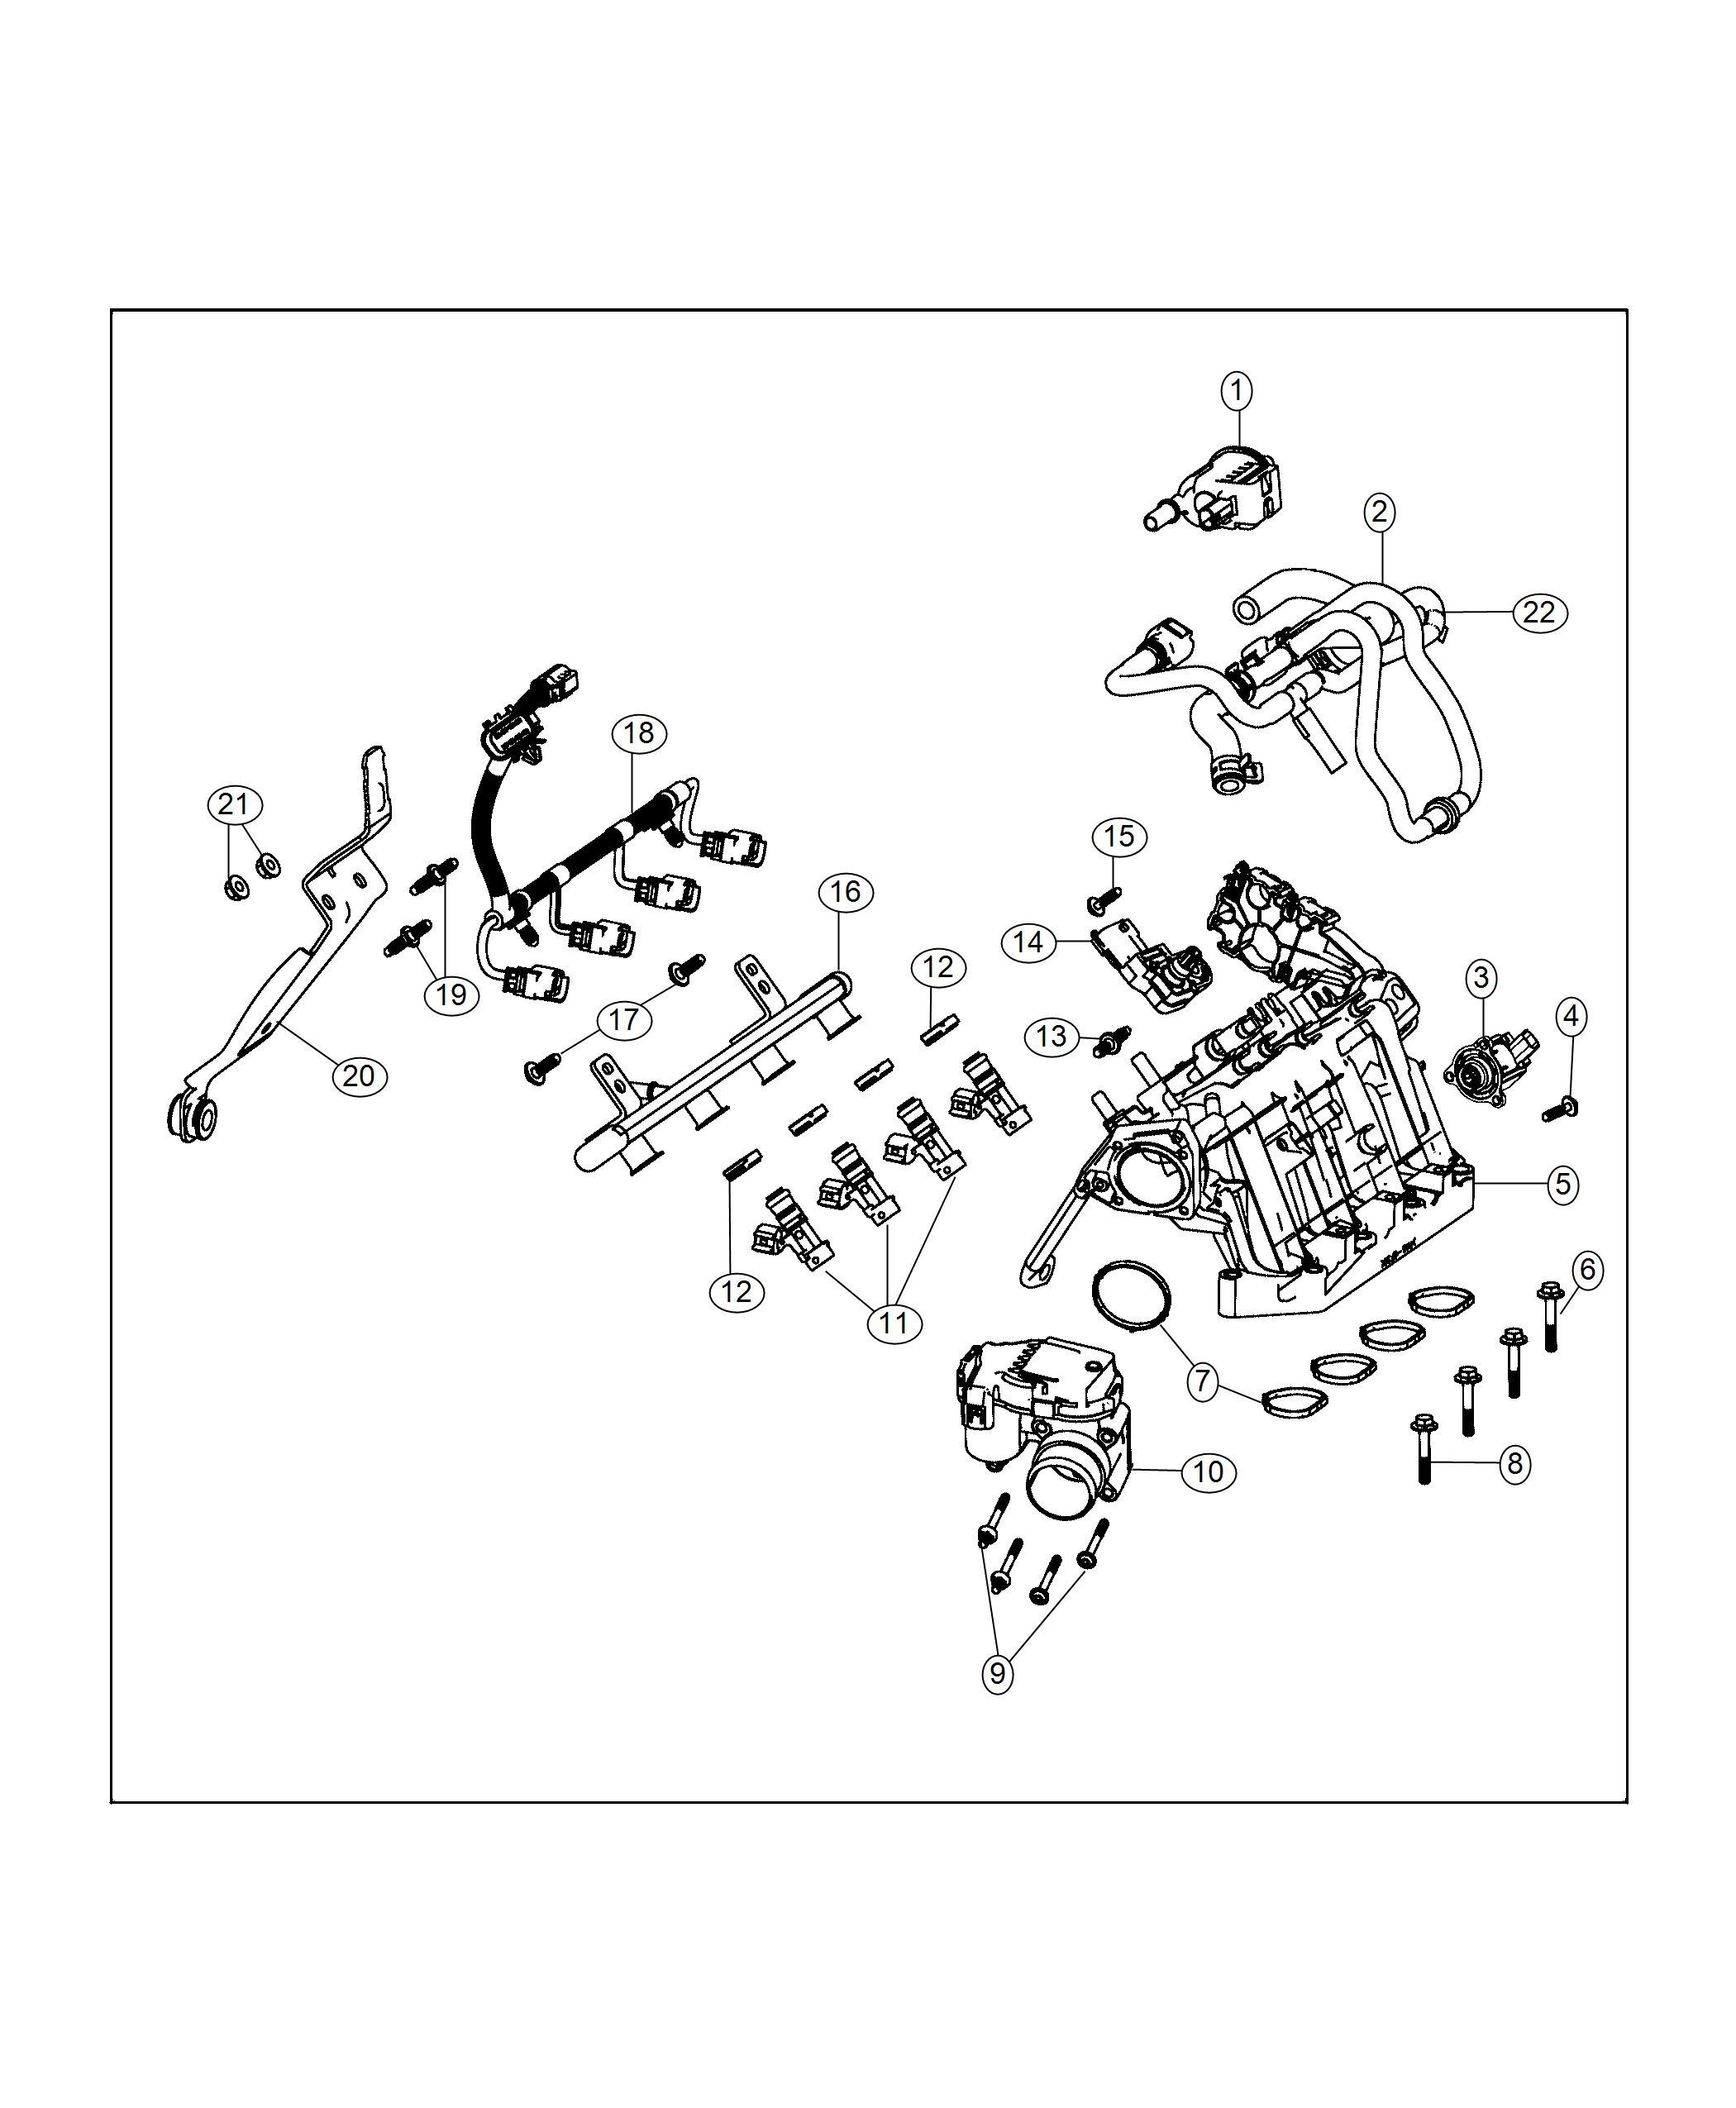 Jeep Renegade Bracket Wiring 160 Horse Power Rating